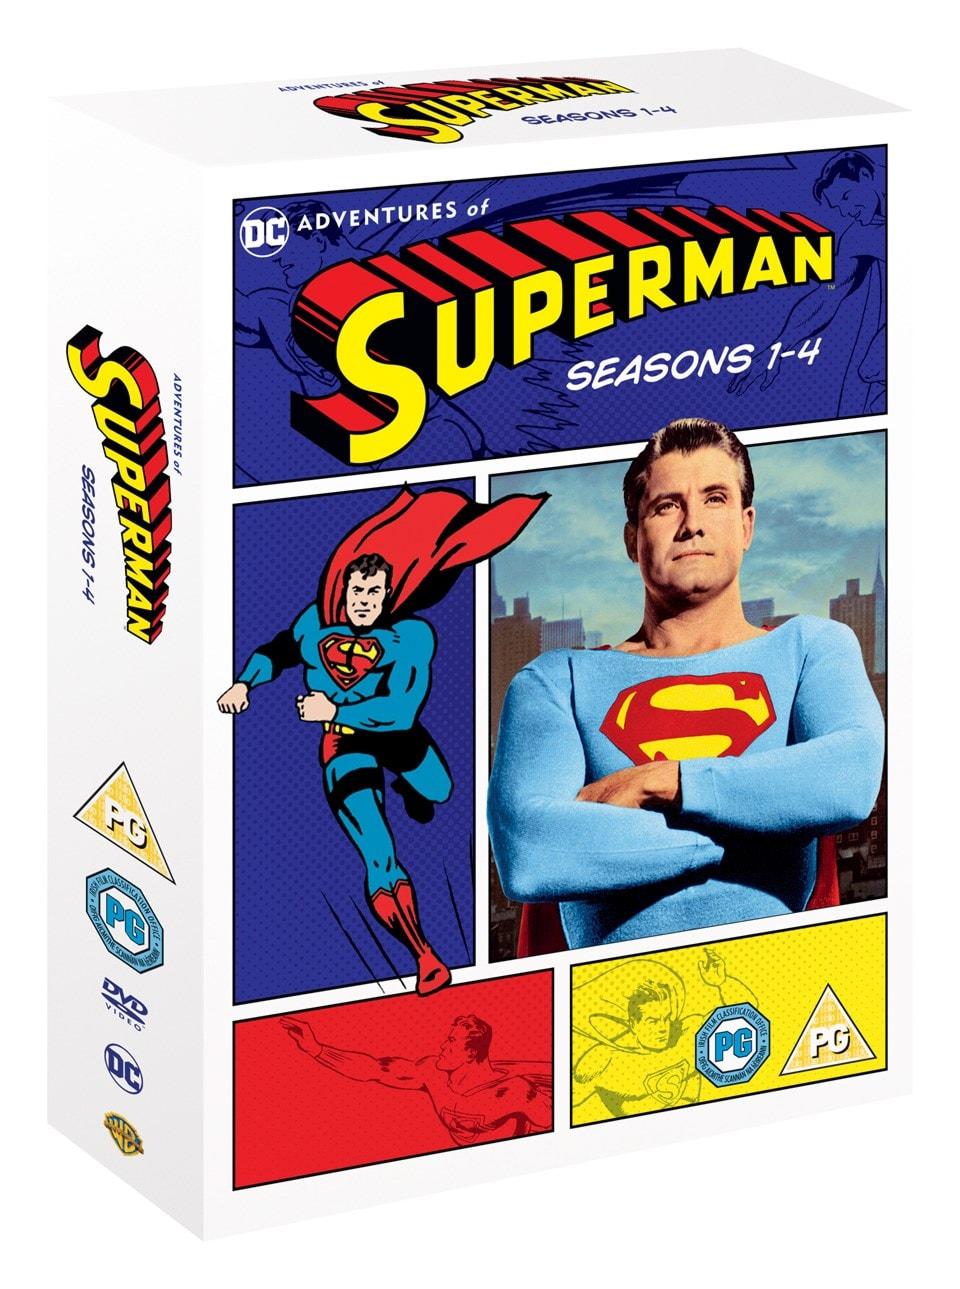 Adventures of Superman: Seasons 1-4 - 2